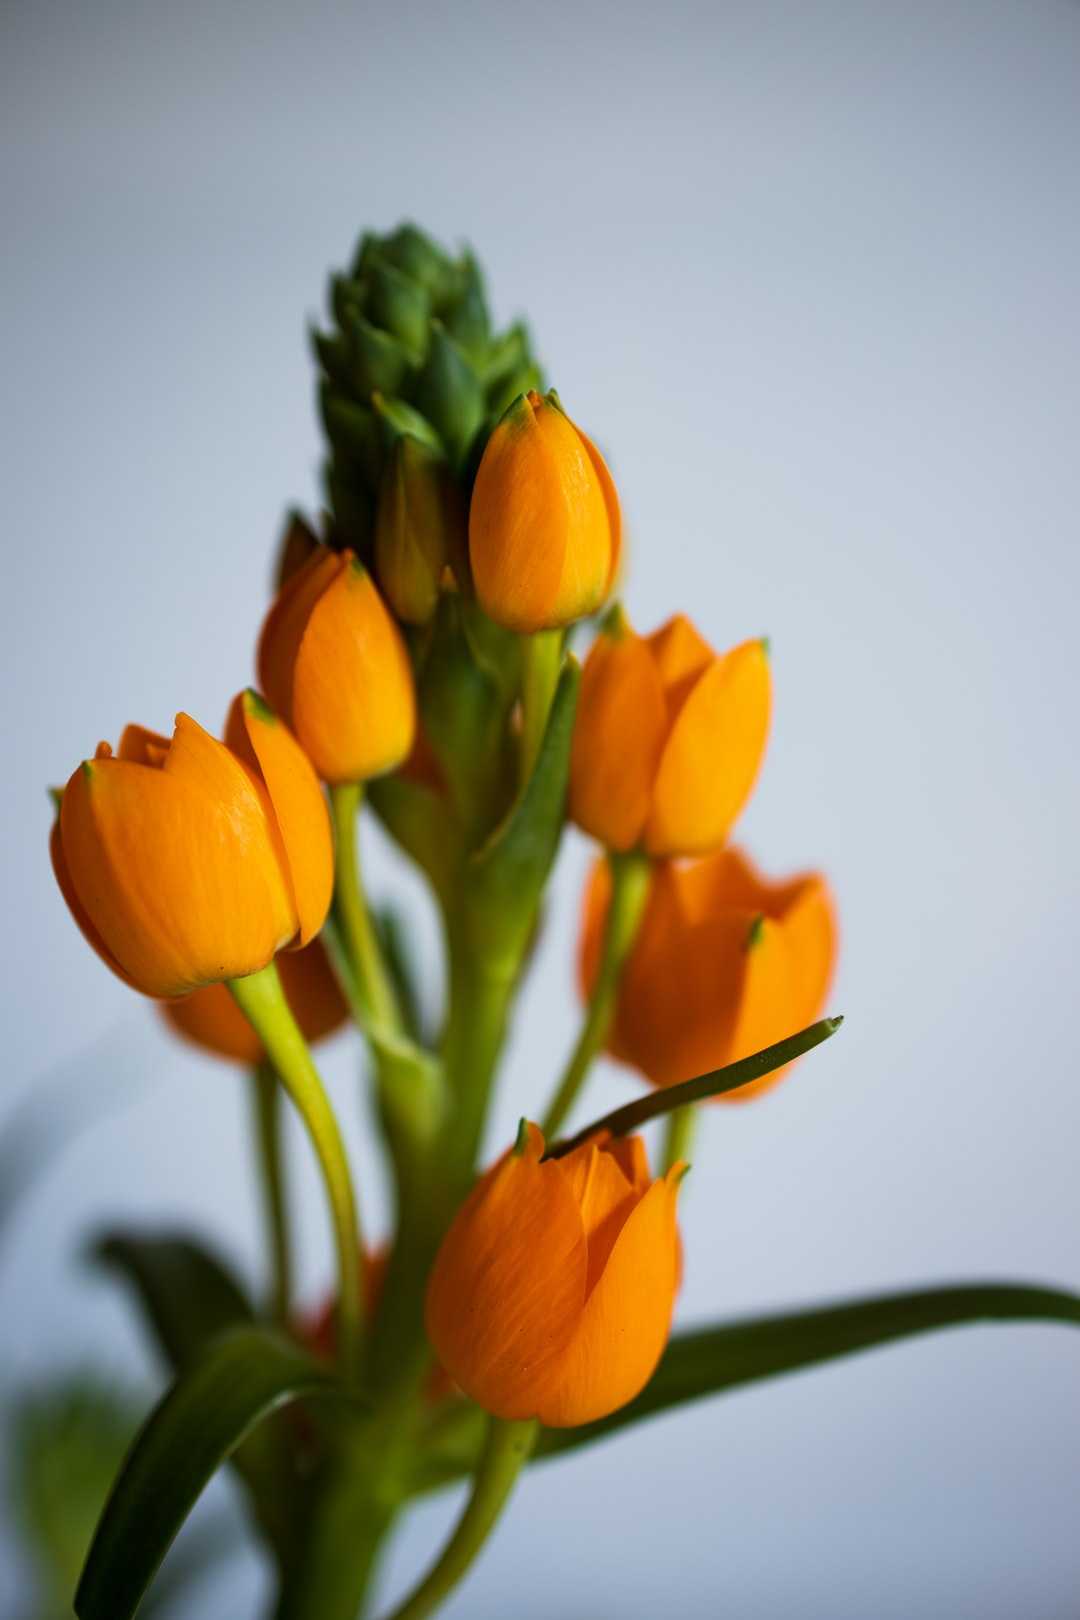 Orange star flowers.